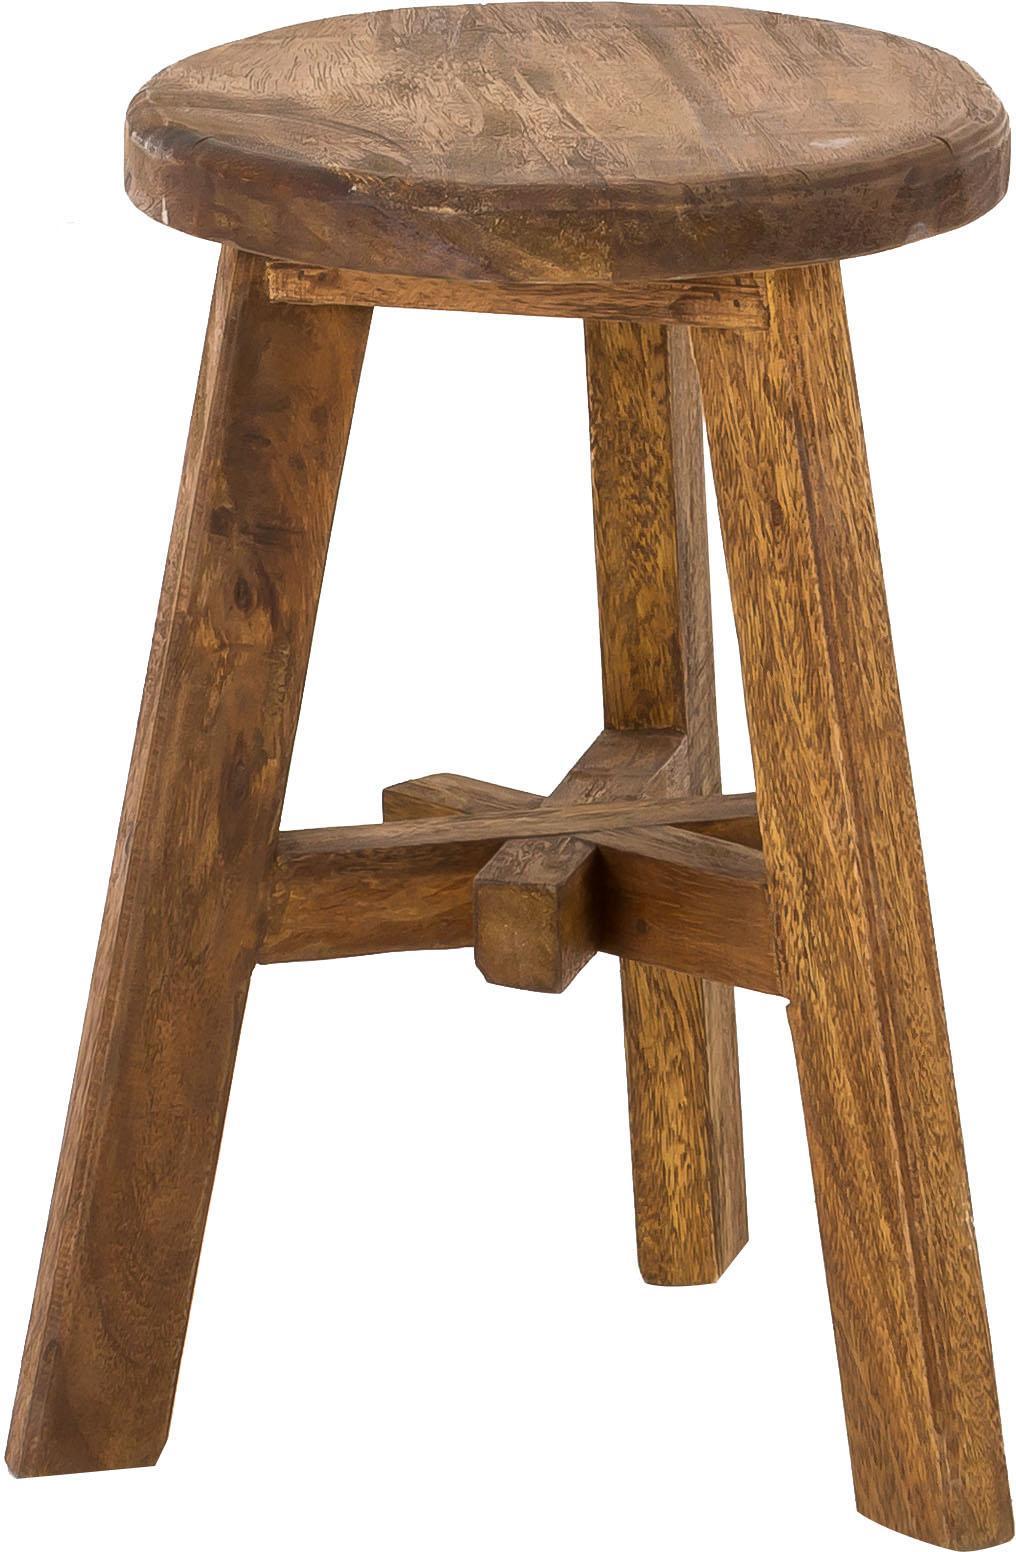 Kruk Dingklik van teakhout, Gebeitst teakhout, Donkerbruin gebeitst teakhout, Ø 35 x H 50 cm